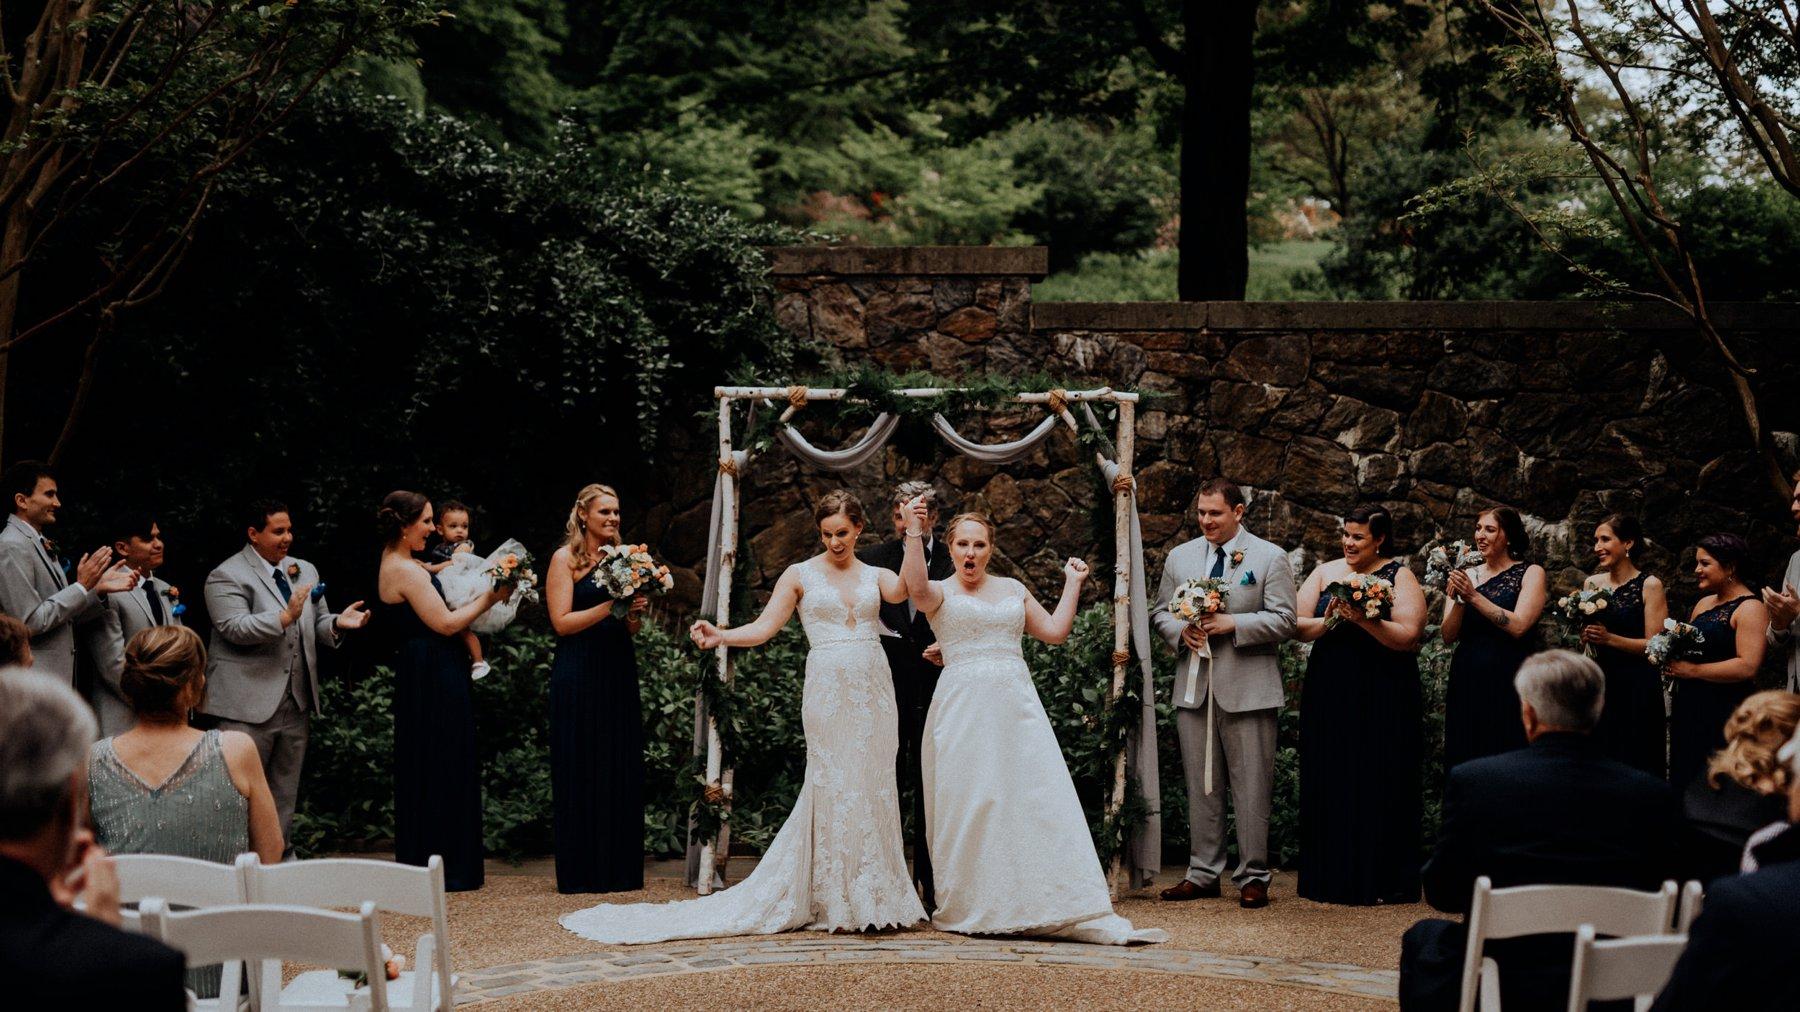 176-171-winterthur-wedding-12.jpg